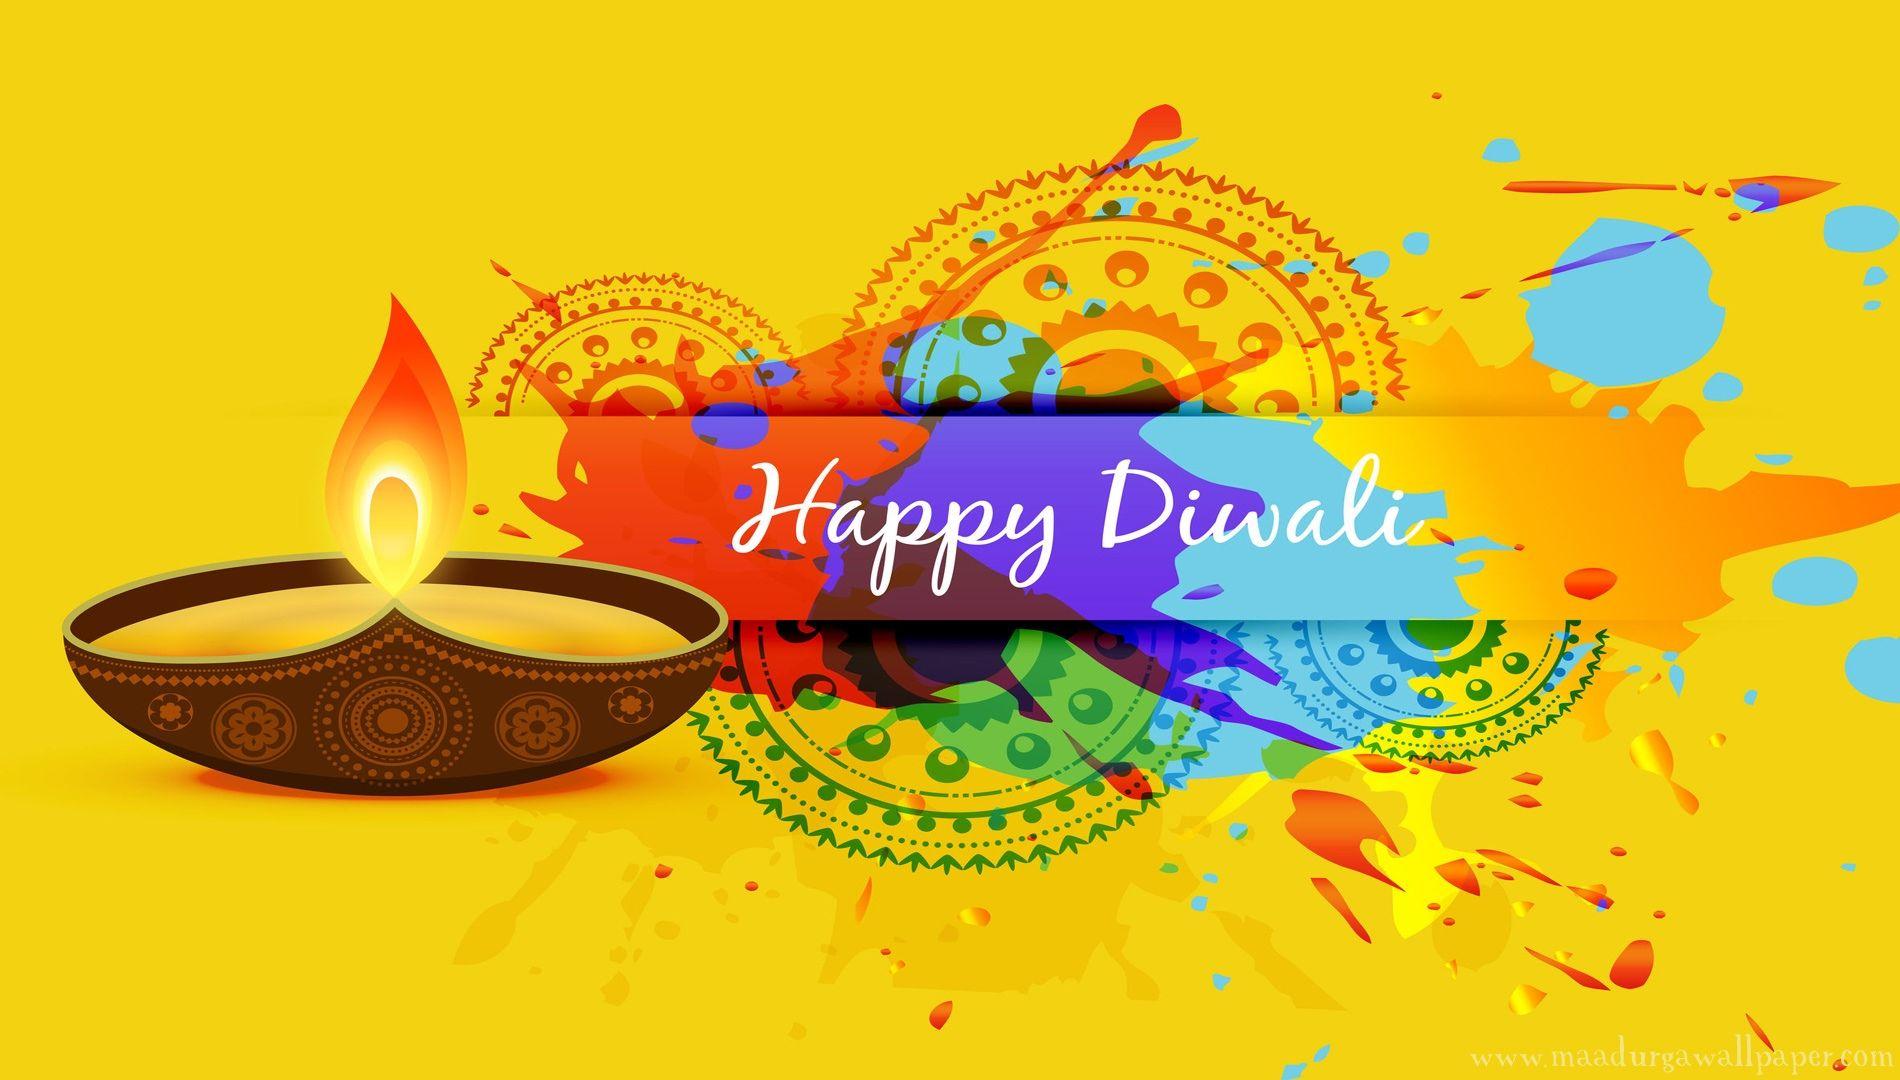 Pin By Santosh Kshirsagar On Diwali Wishes Happy Diwali Diwali Wishes Happy Diwali 2017